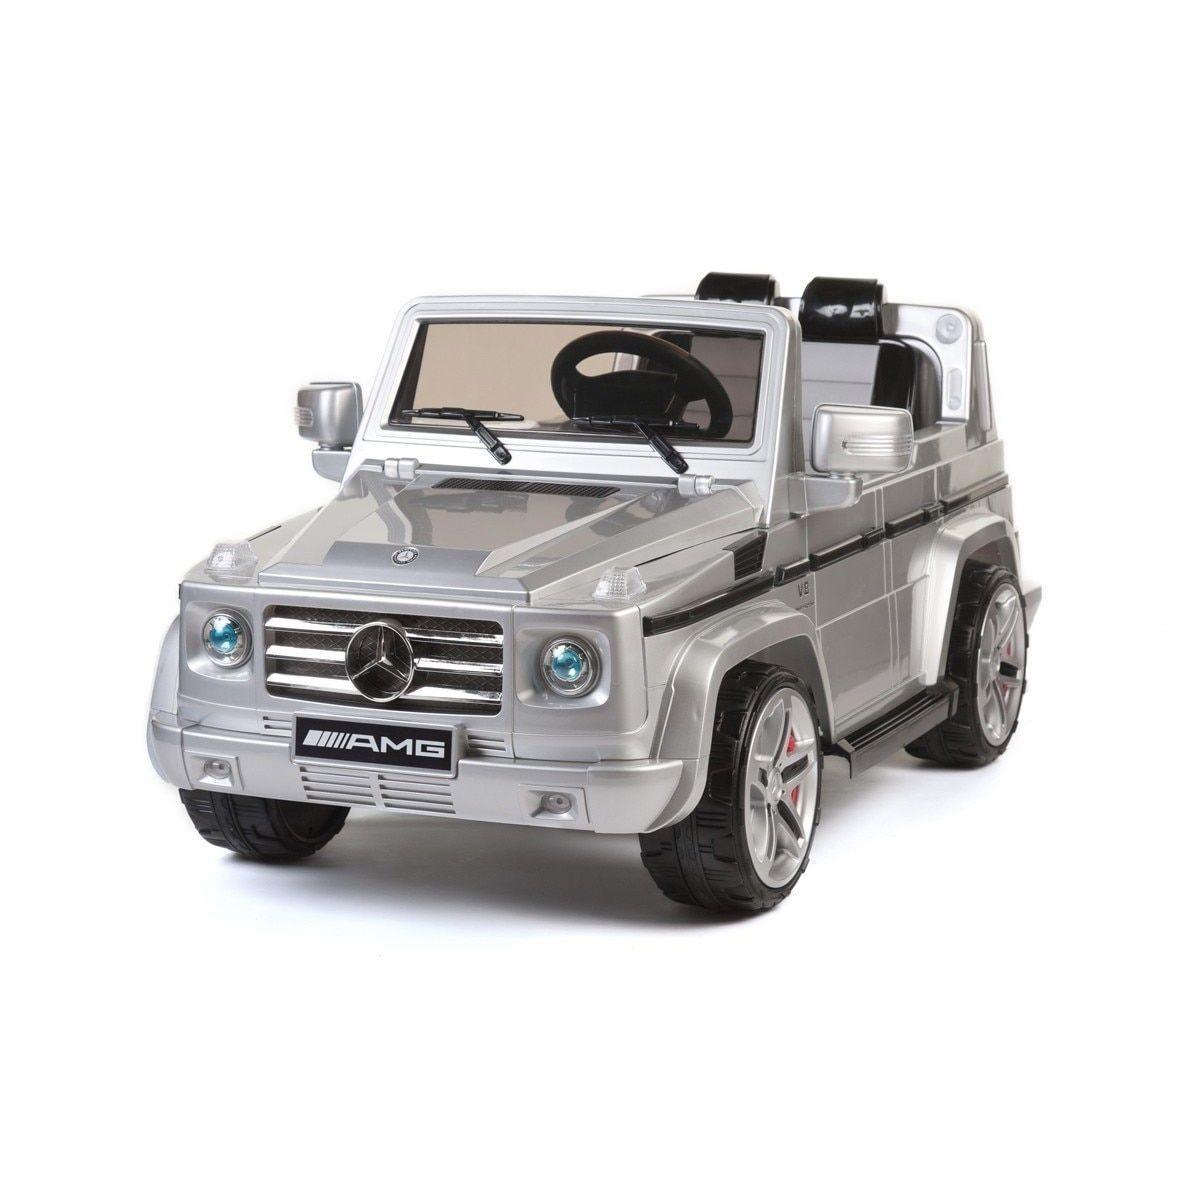 Best Ride On Cars 12-volt Mercedes Benz G55